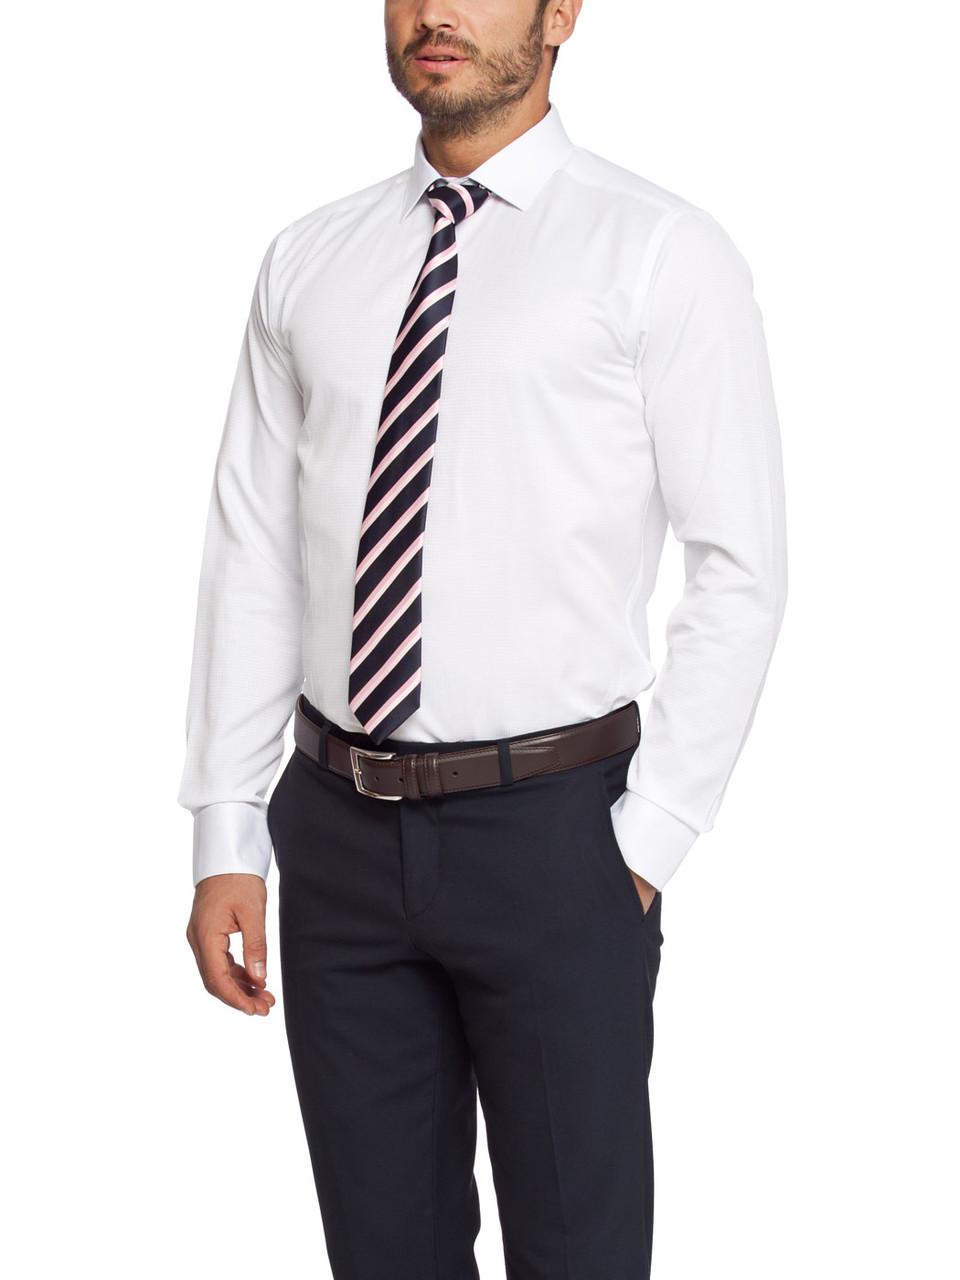 Мужская рубашка LC Waikiki белого цвета в мелкую клетку